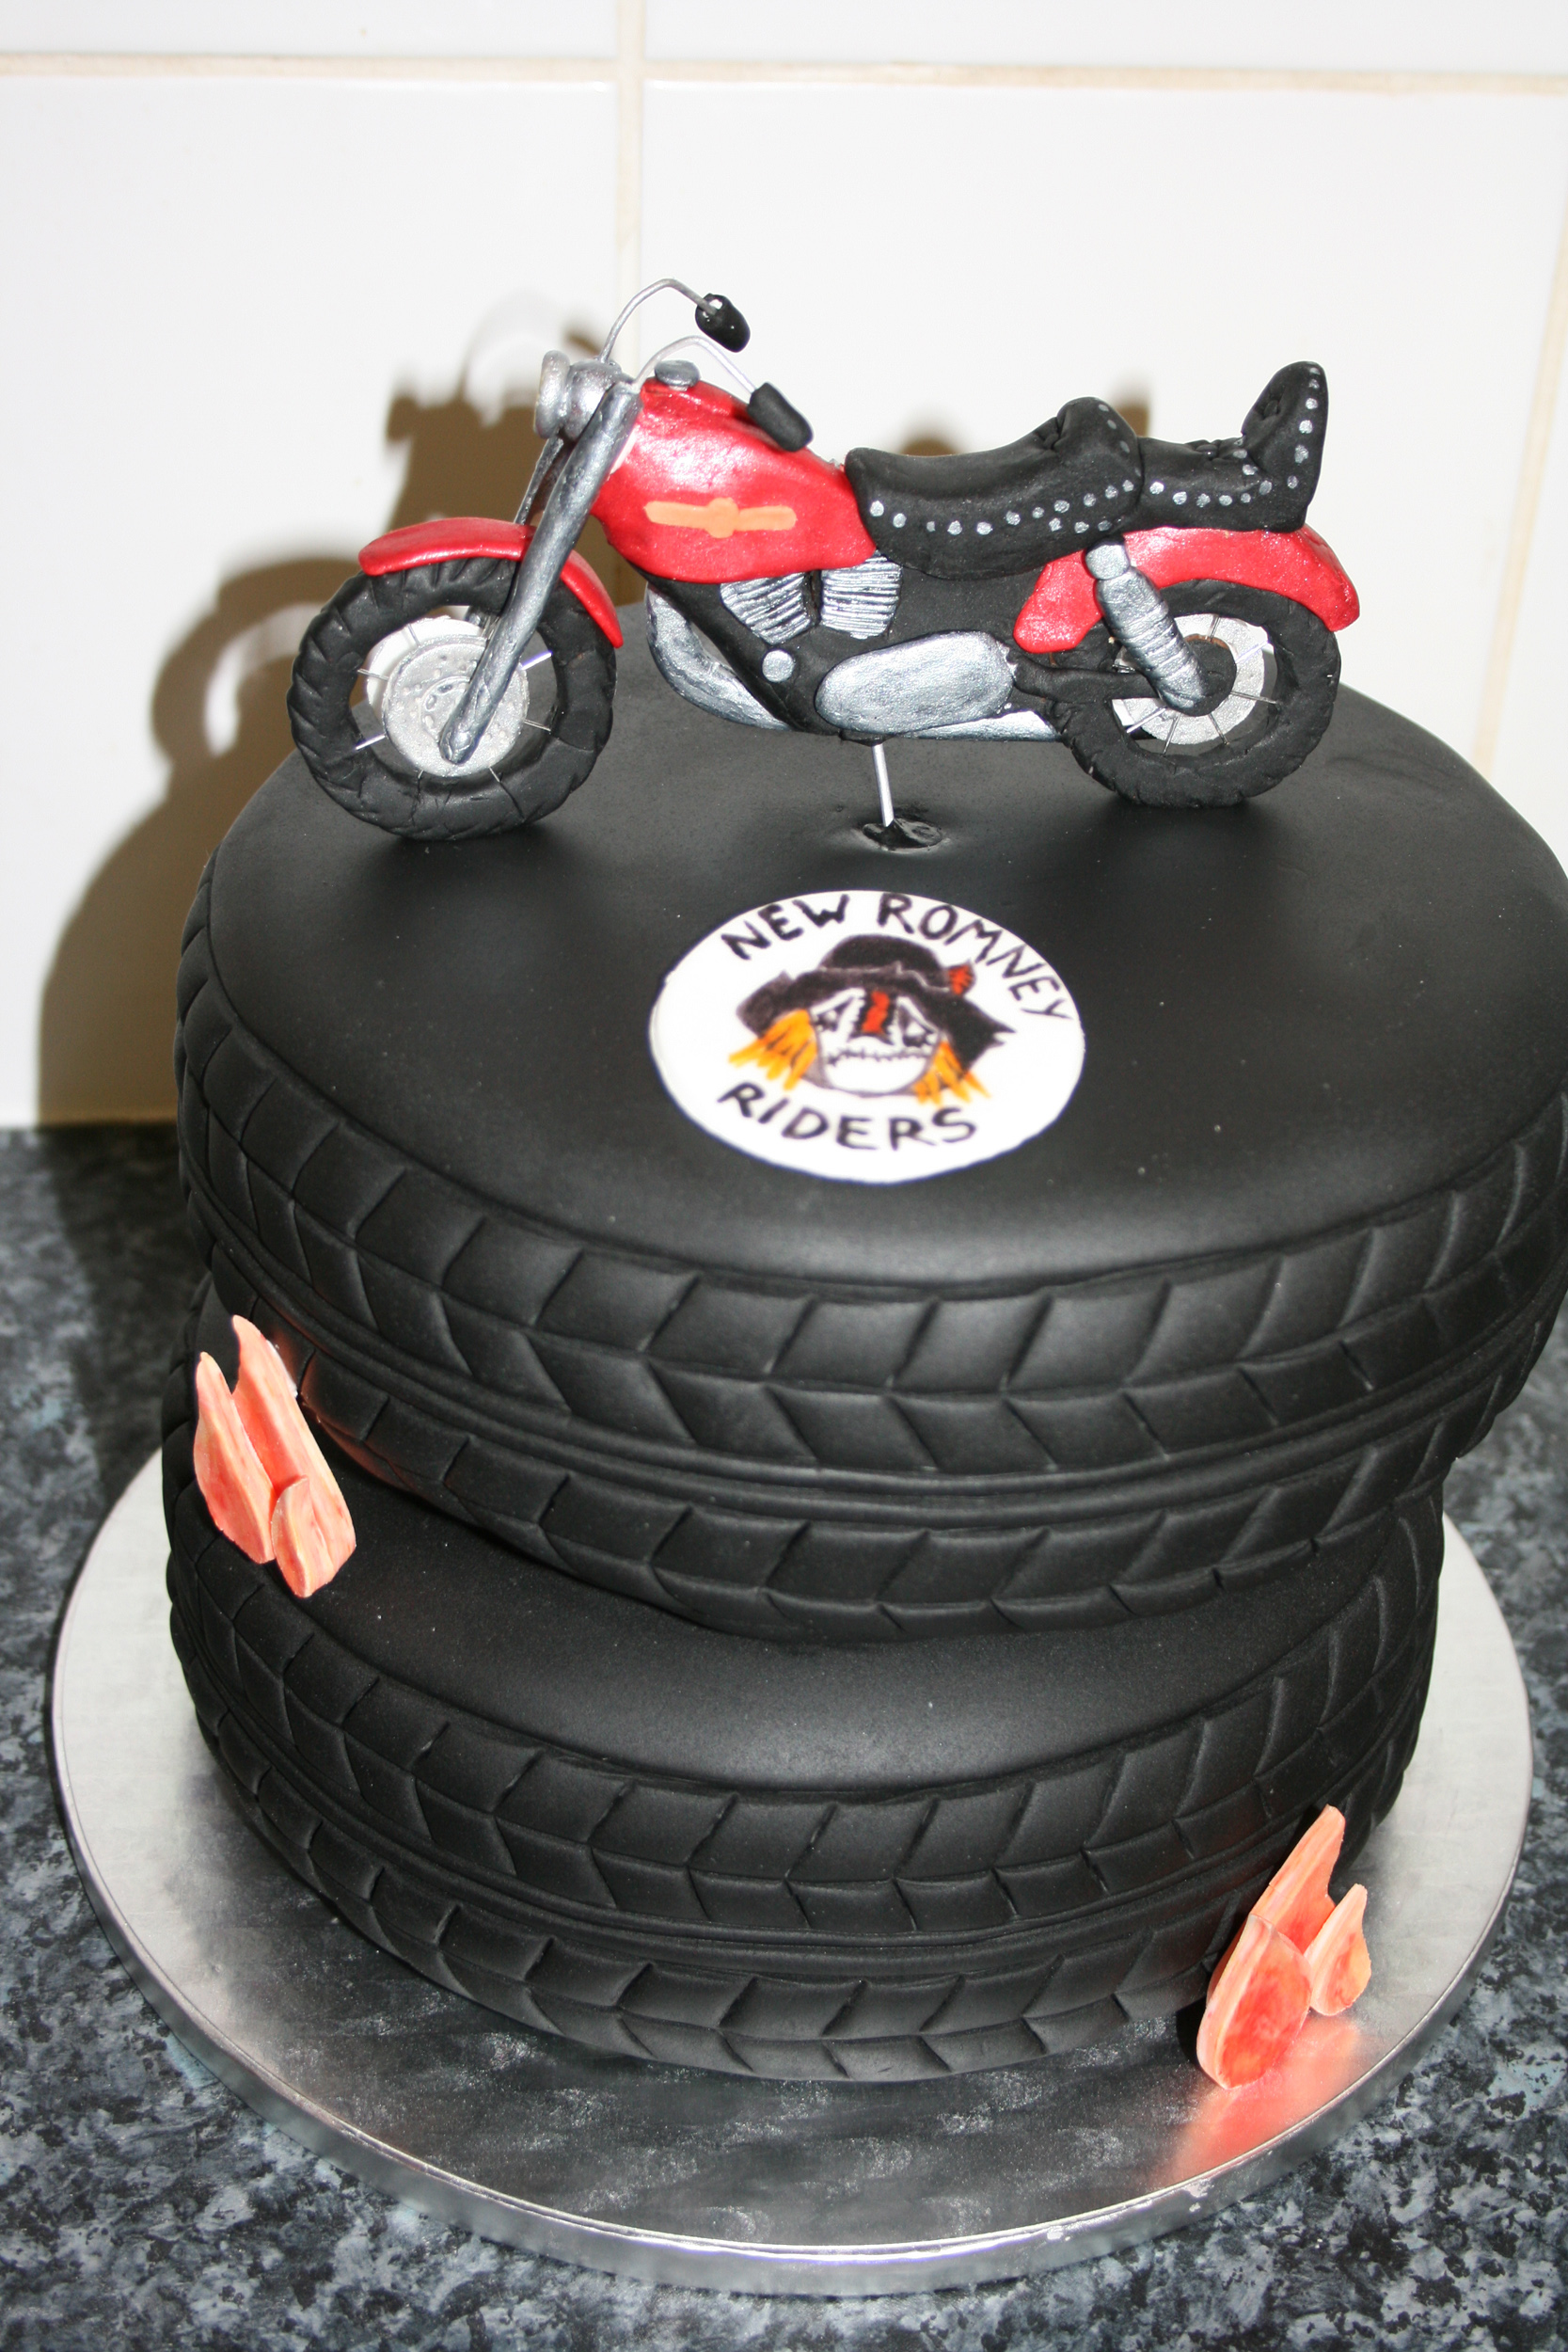 7 Harley Motorcycle Cakes Photo Harley Davidson Cake Candlewick